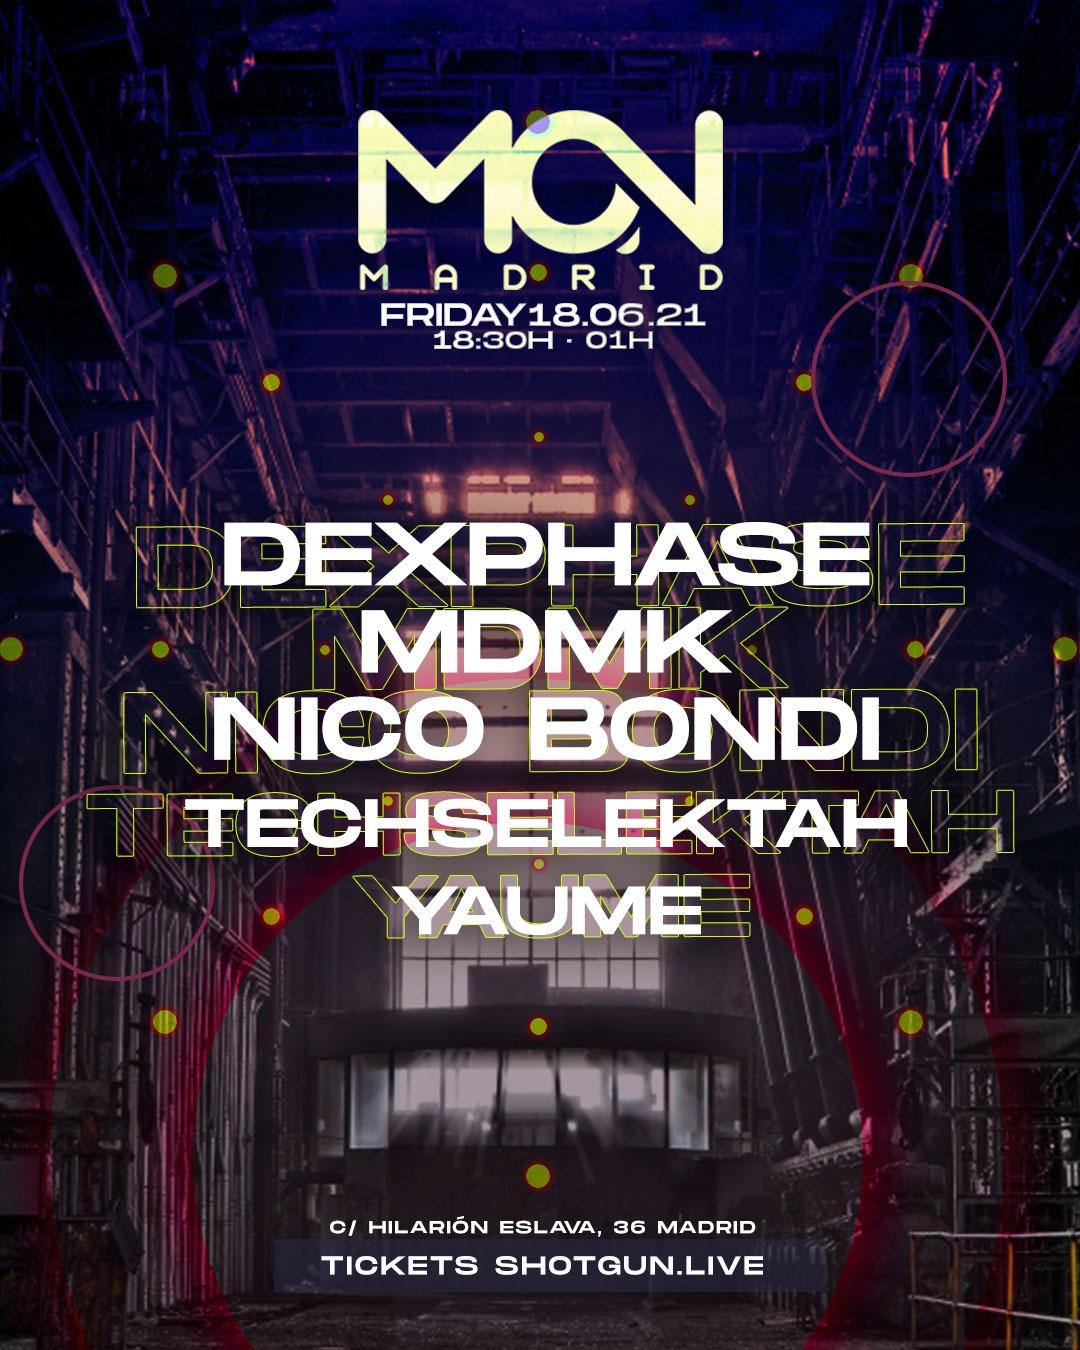 Dexphase, MDMK & Nico Bondi @ Mon Madrid